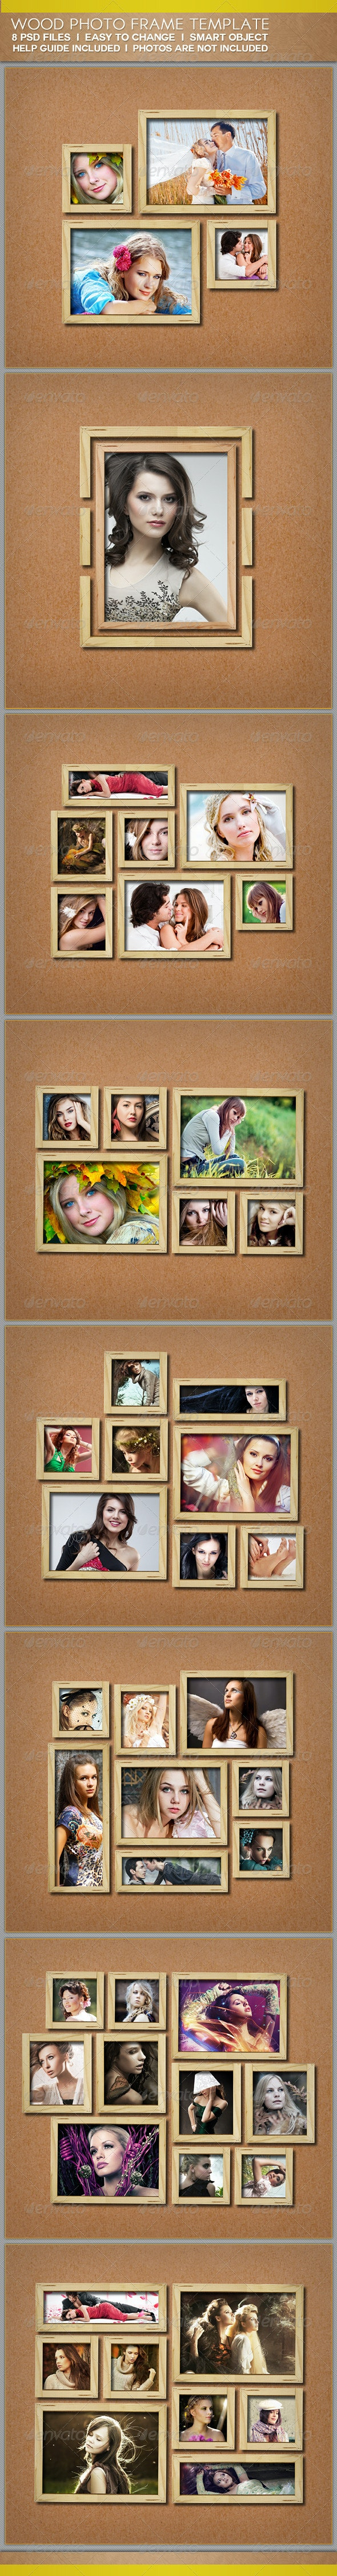 Wood Photo Frame Templates - Miscellaneous Photo Templates